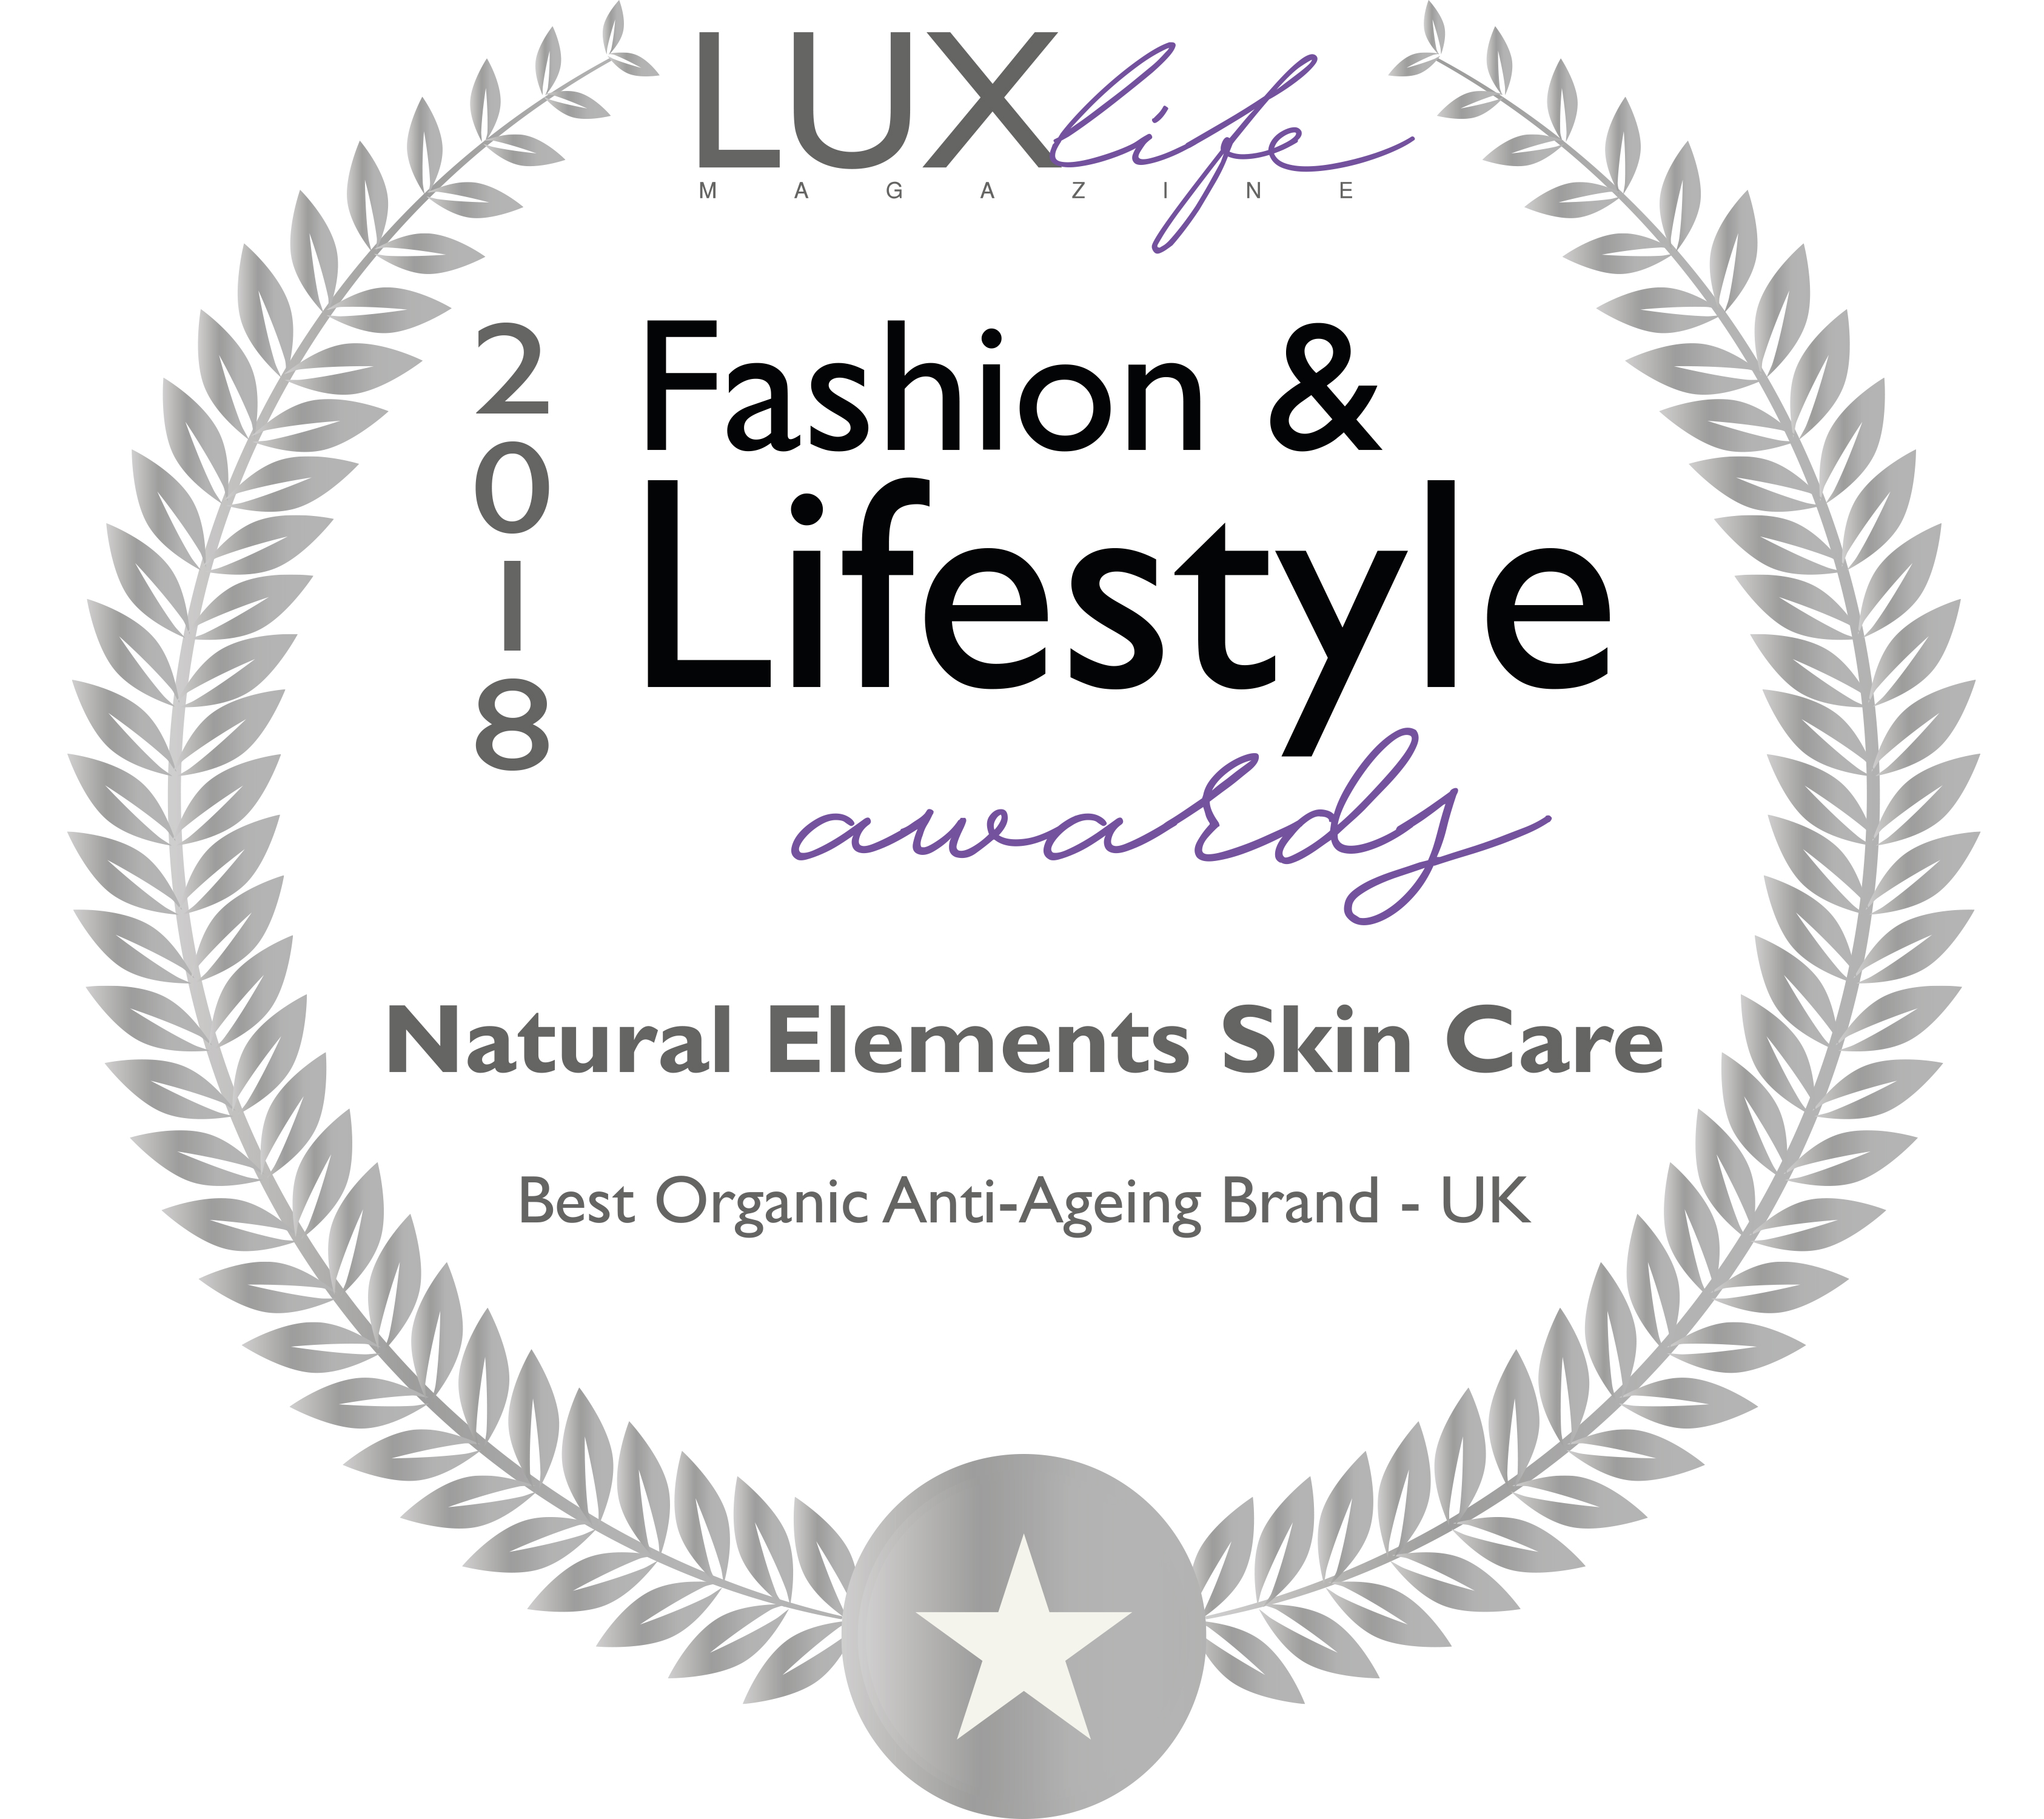 fal18024-lux-fashion-lifestyle-award-winners-logo-002-.jpg